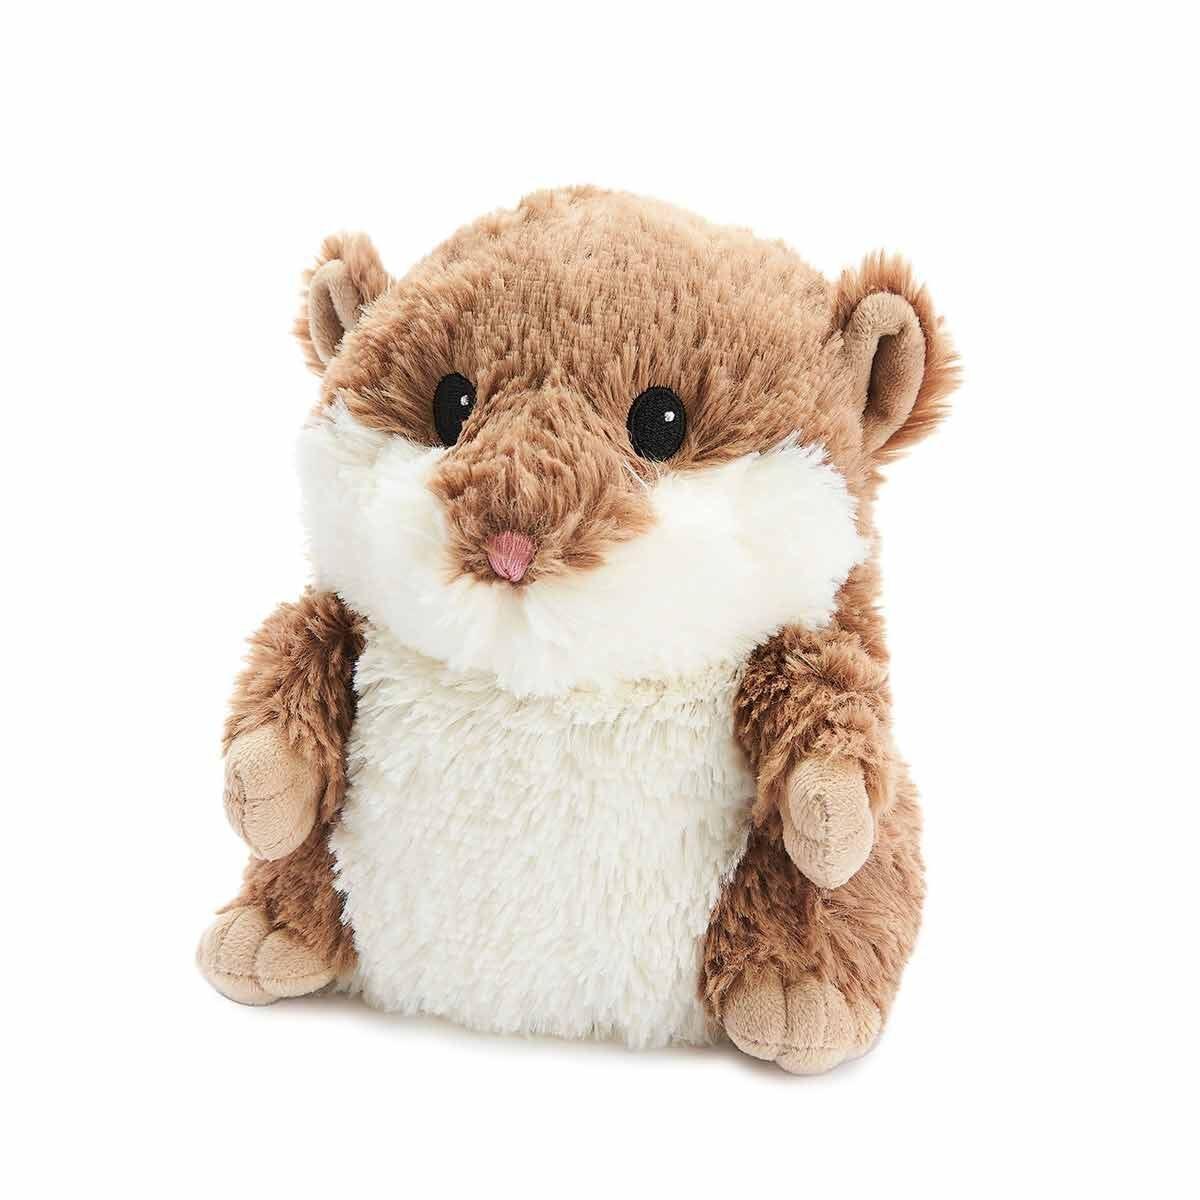 Warmies Hamster Microwaveable Toy